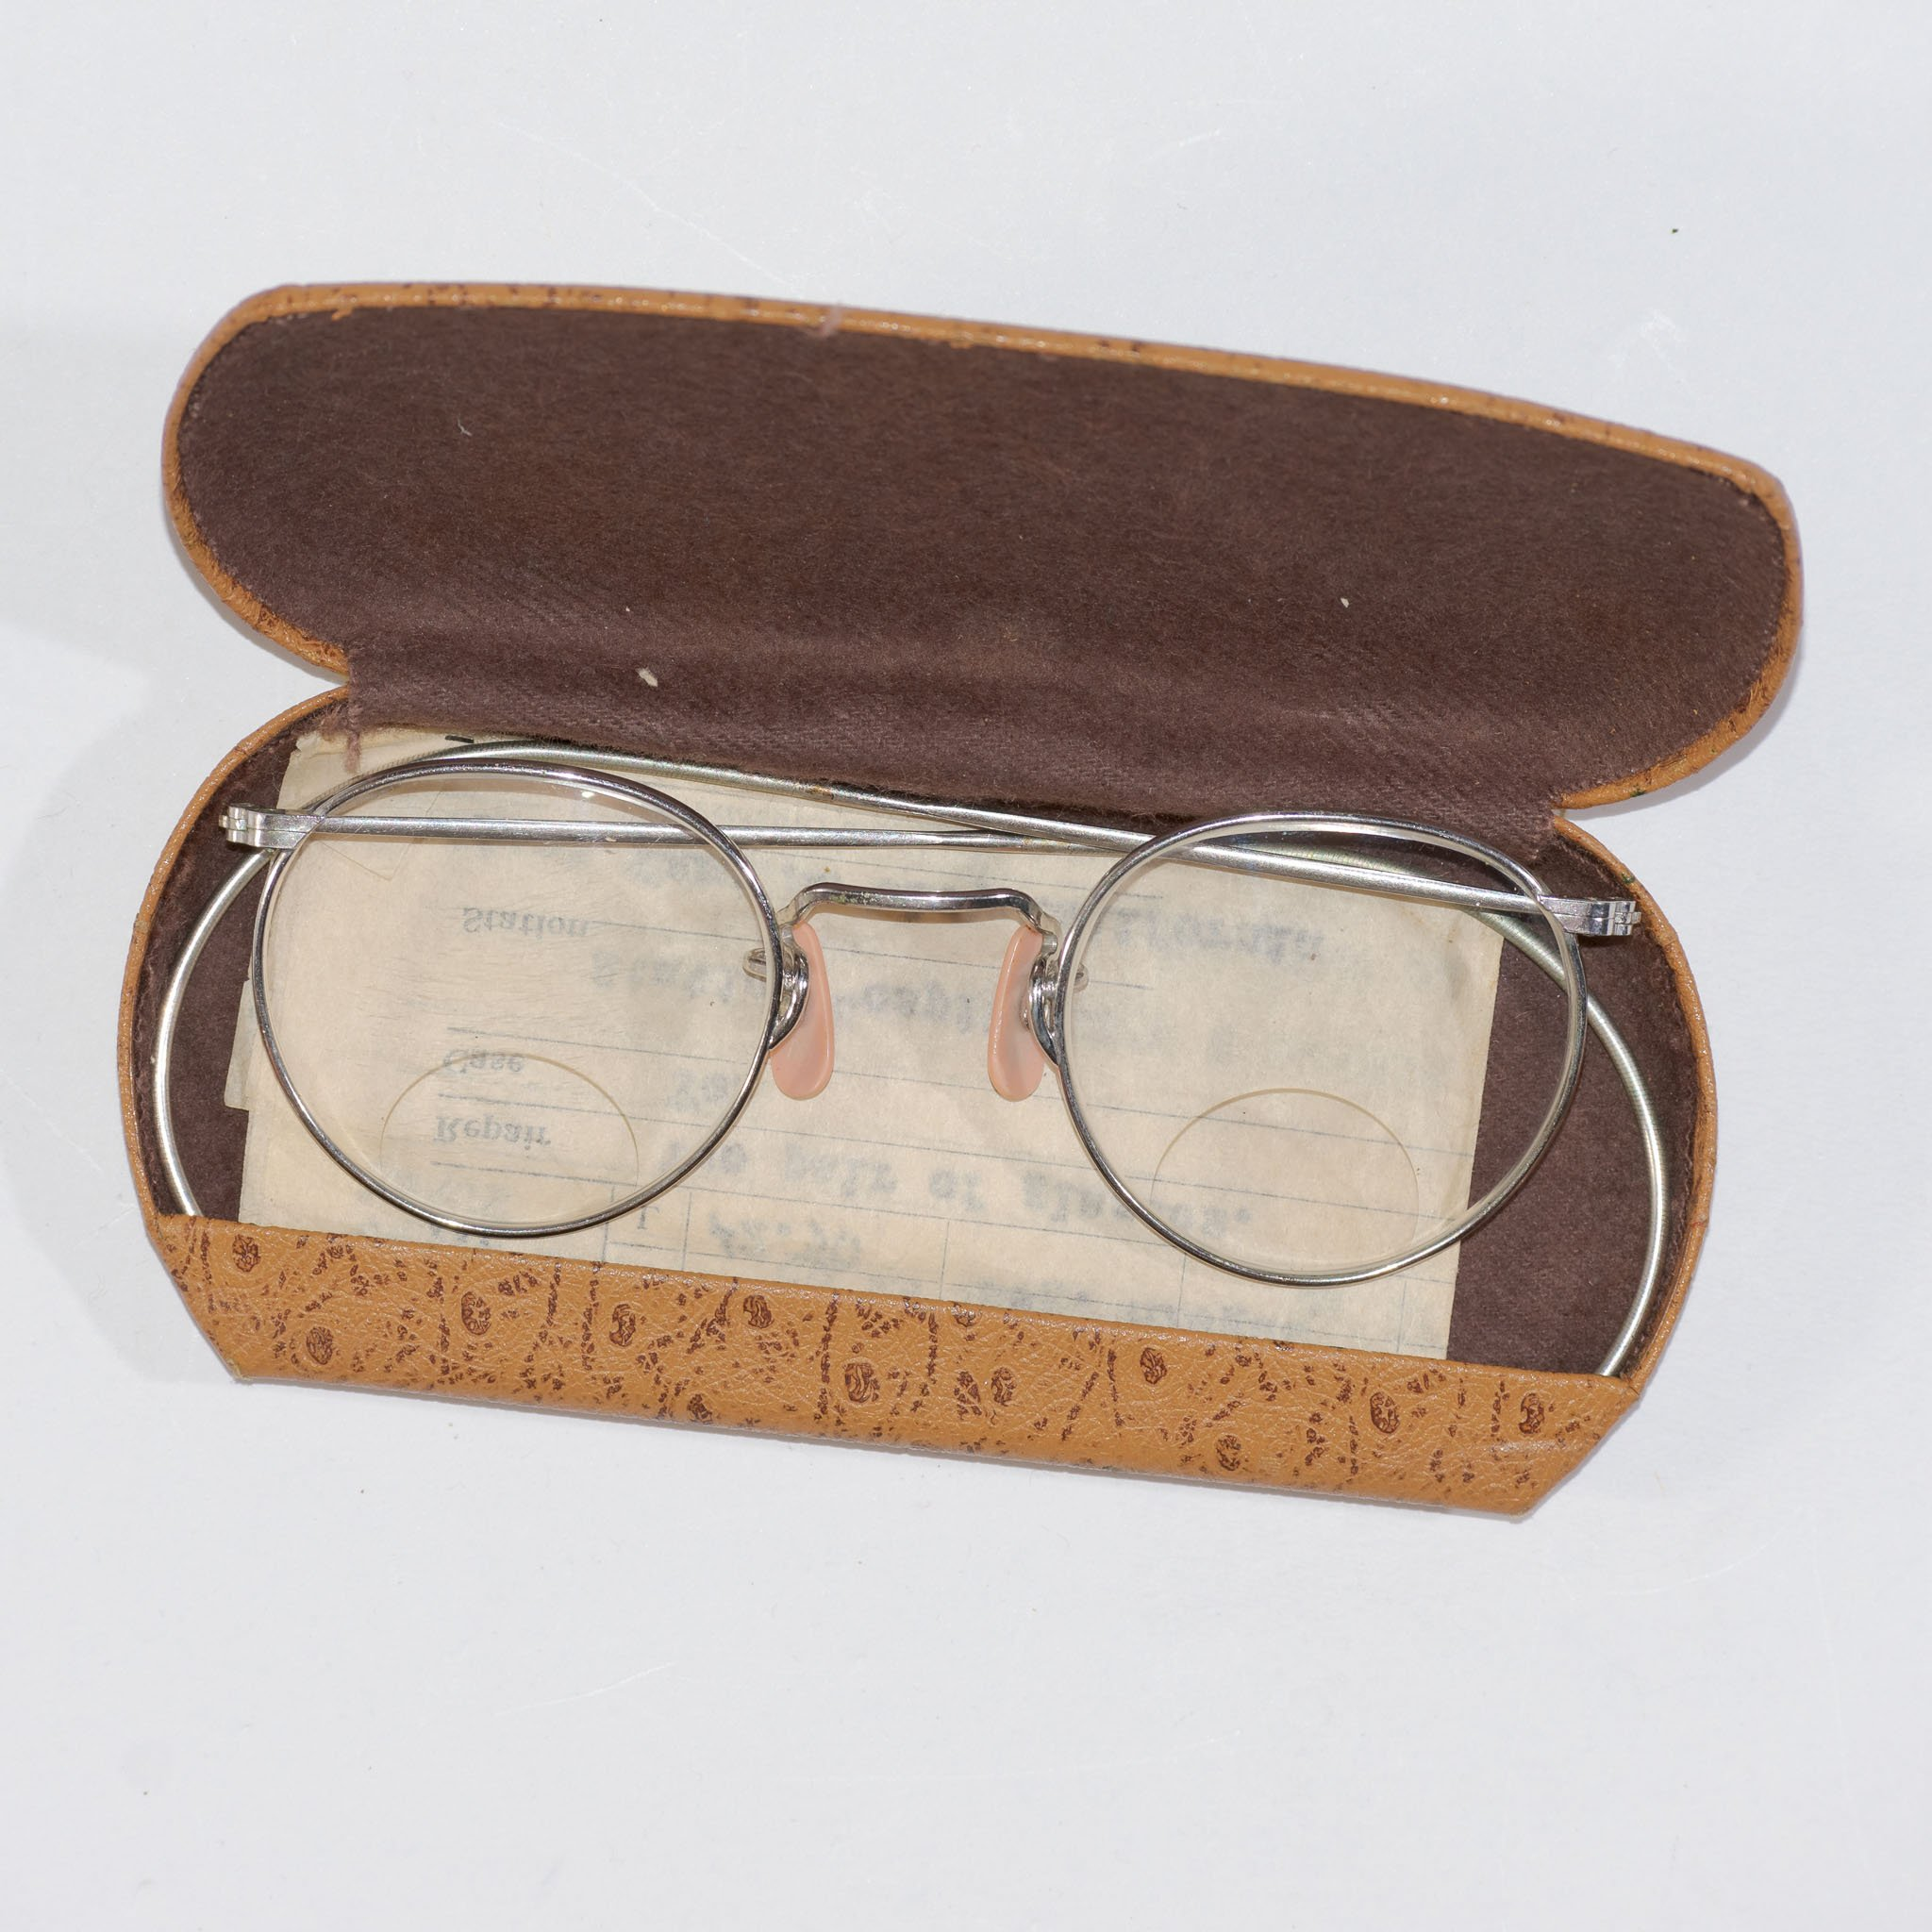 b1551083353 World War 2 Eyeglasses   Prescription Order Form for Lt Col Clarence  Hennessy –  itisvintage  military  1940sfashion  usarmy  ww2   vintagefashion  ephemera ...